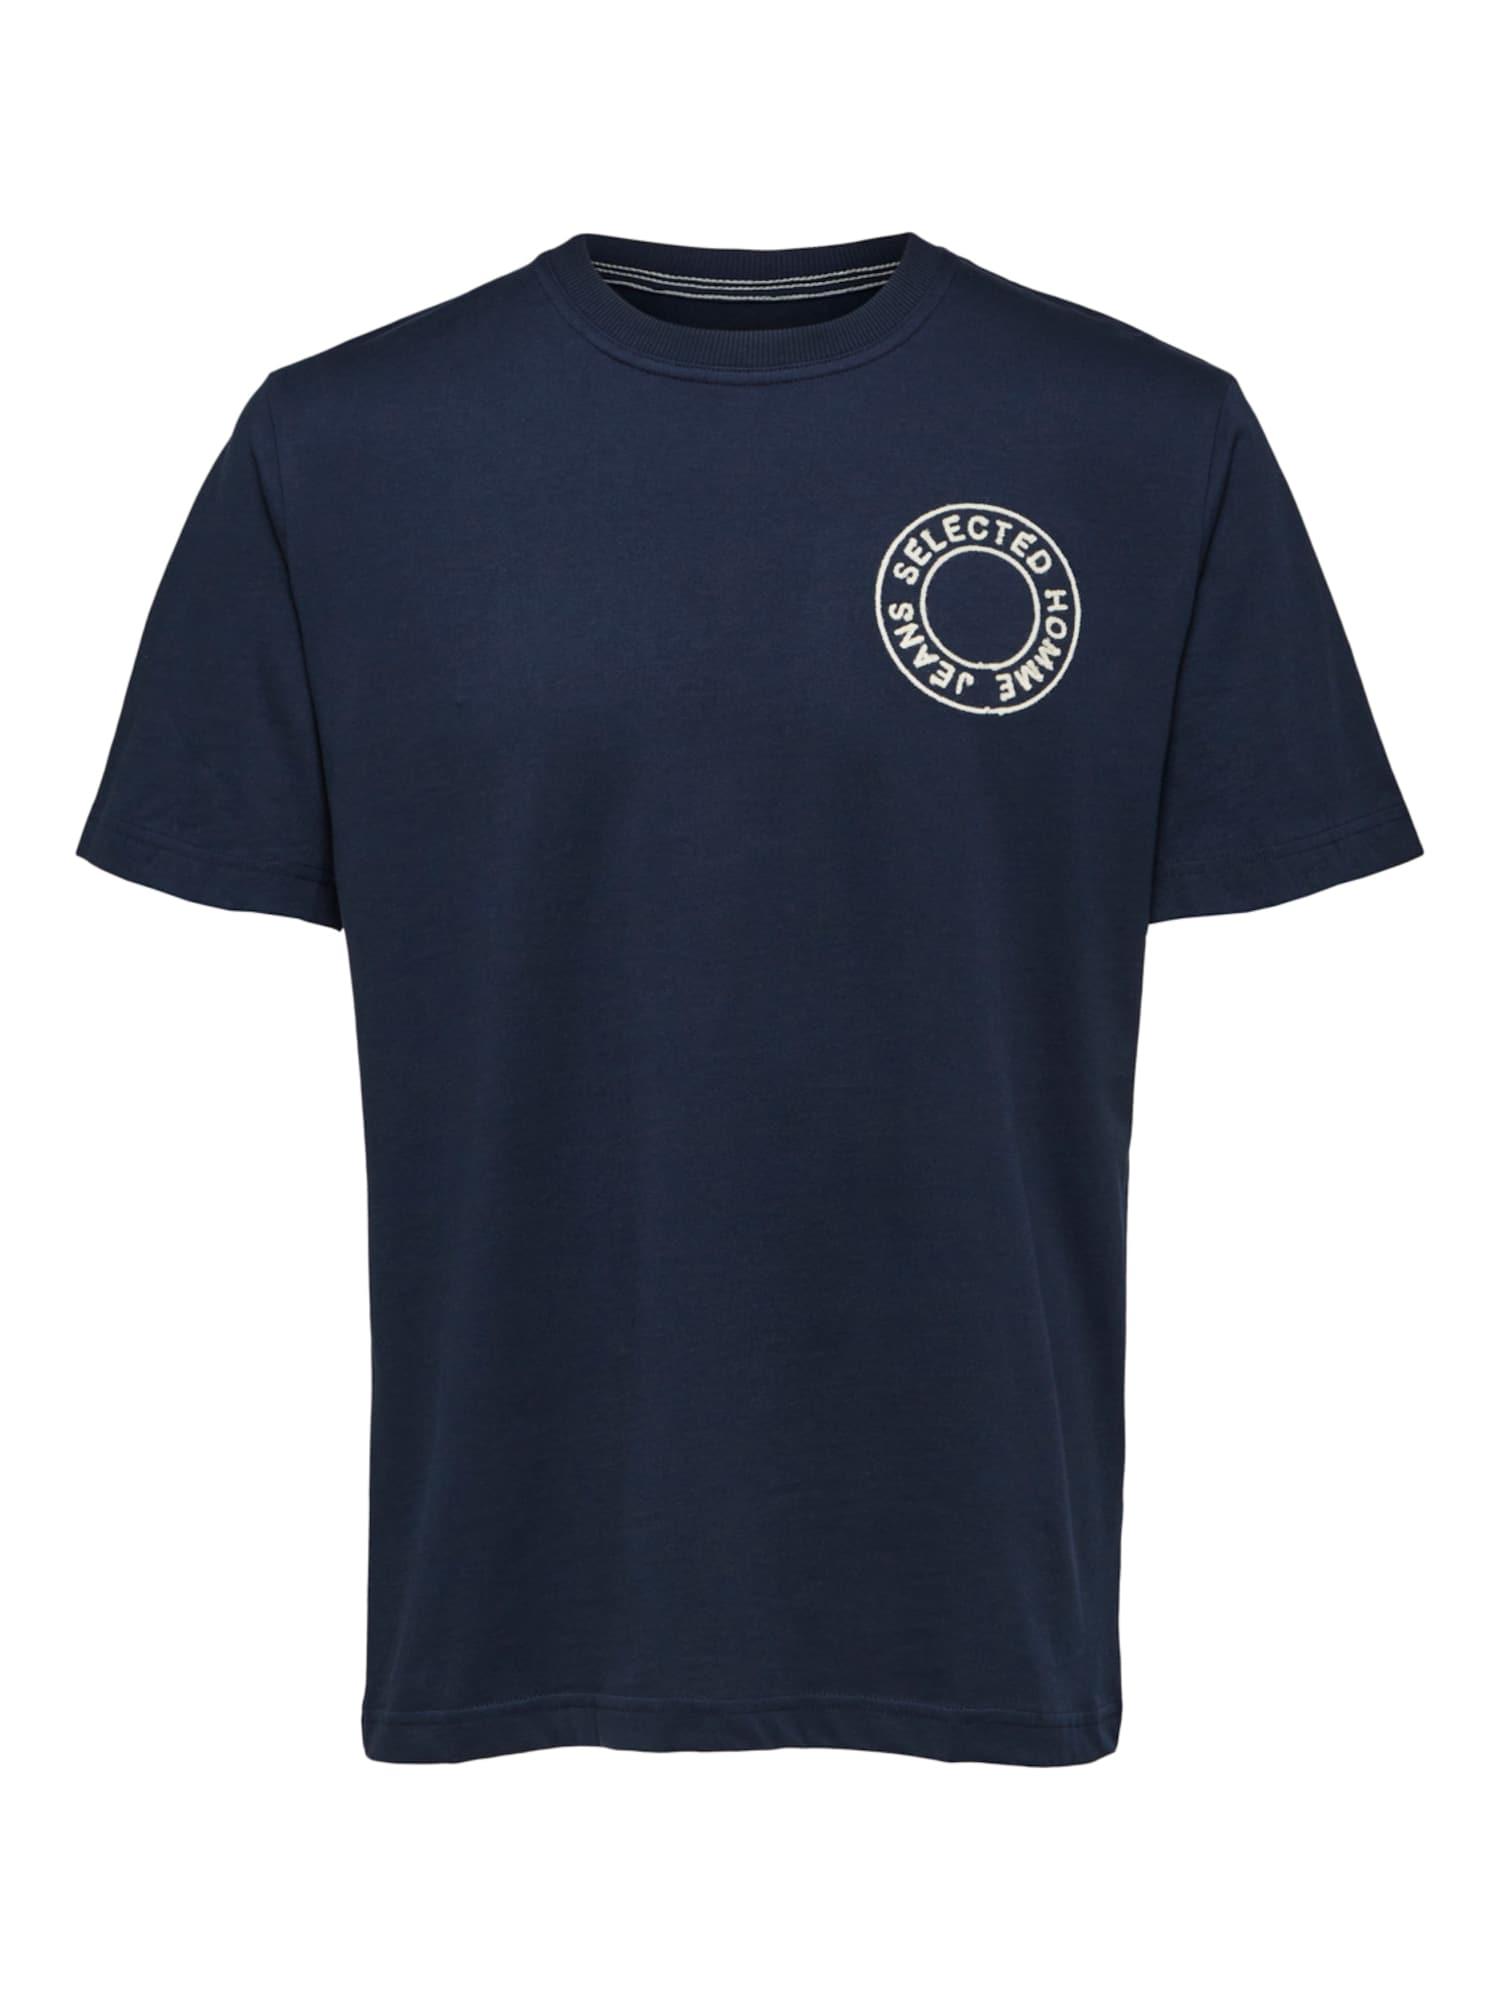 SELECTED Marškinėliai mėlyna